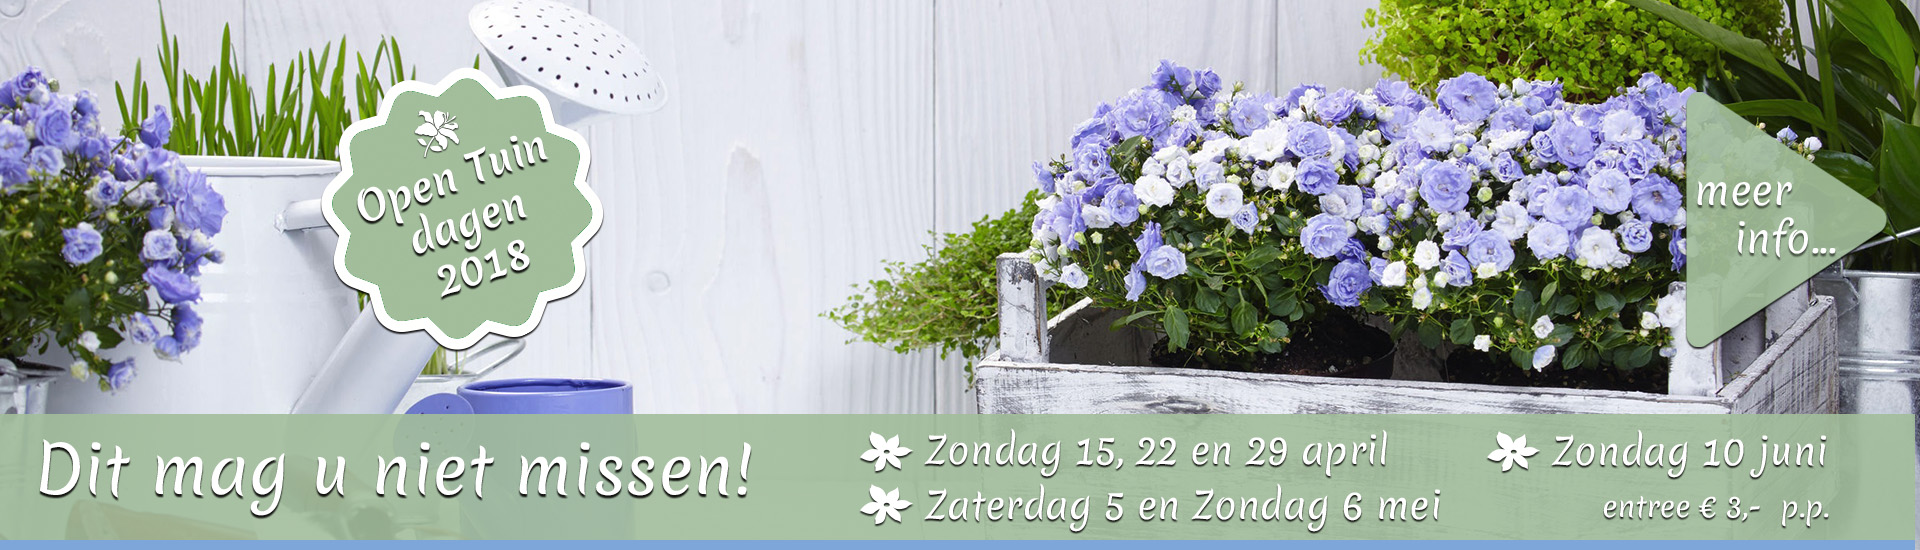 banner_open_tuindagen_2018